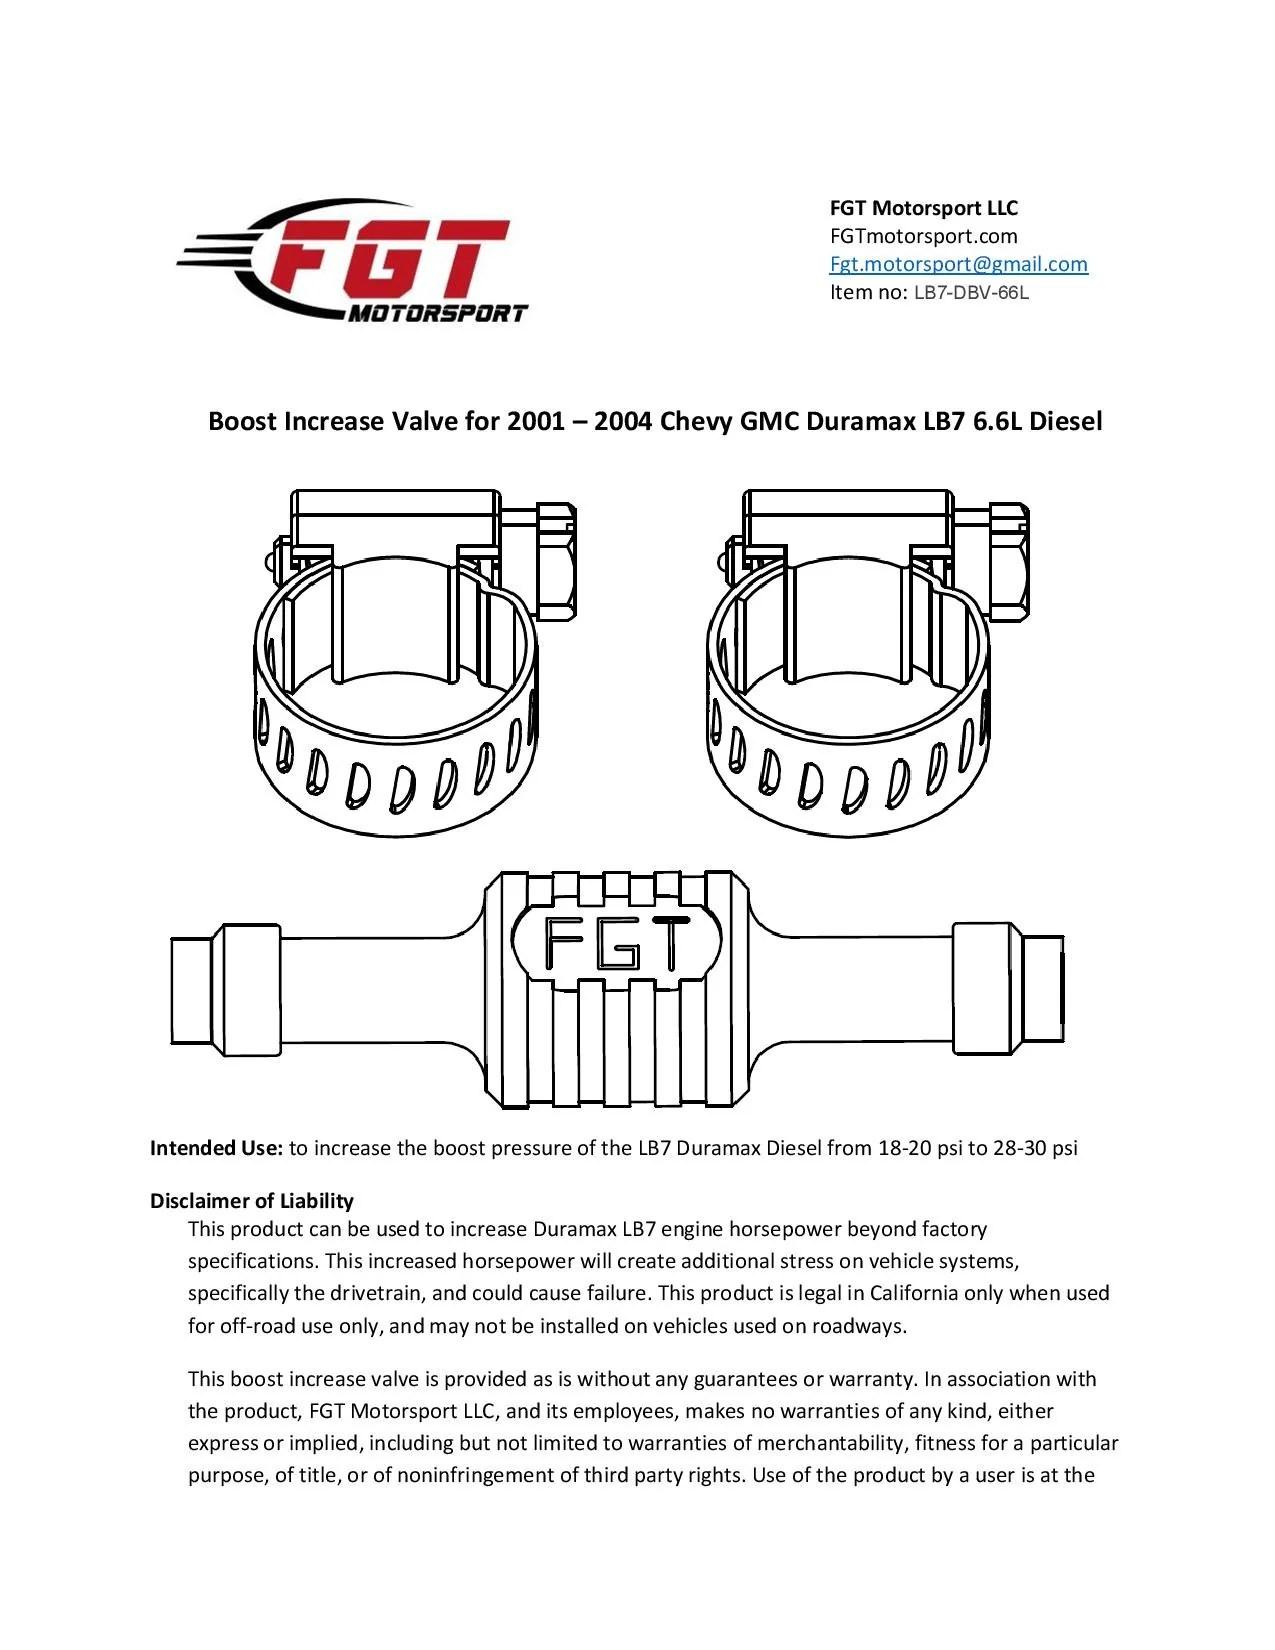 medium resolution of boost increase valve for 01 04 duramax 6 6l lb7 chevy silverado